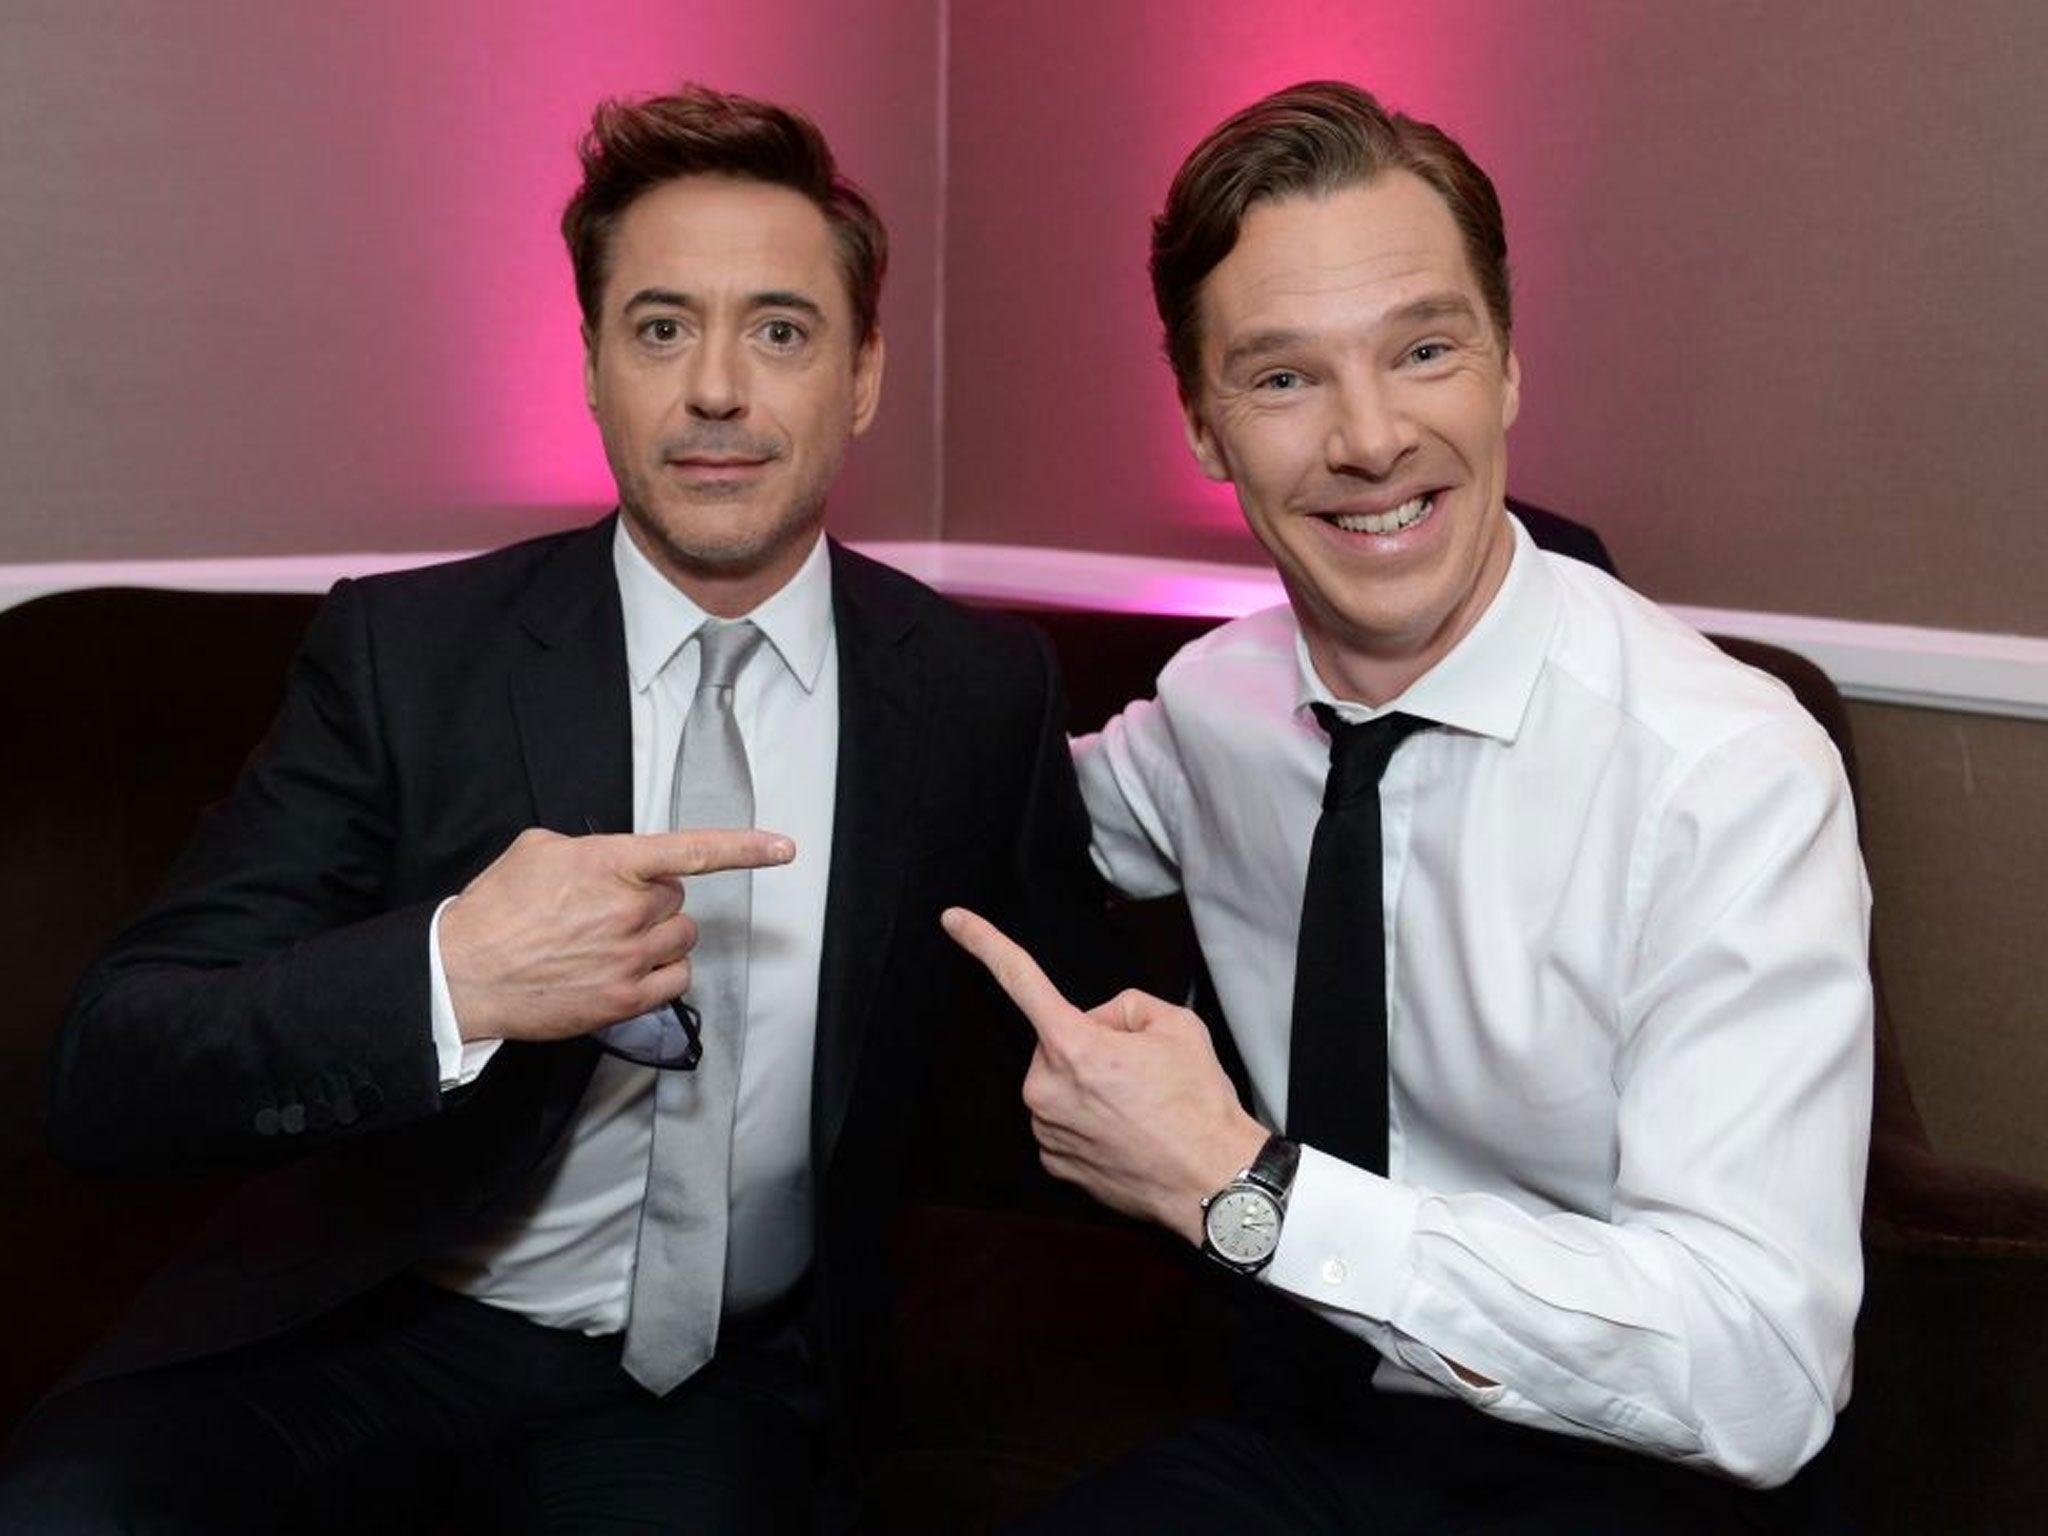 Benedict Cumberbatch and Robert Downey Jr..